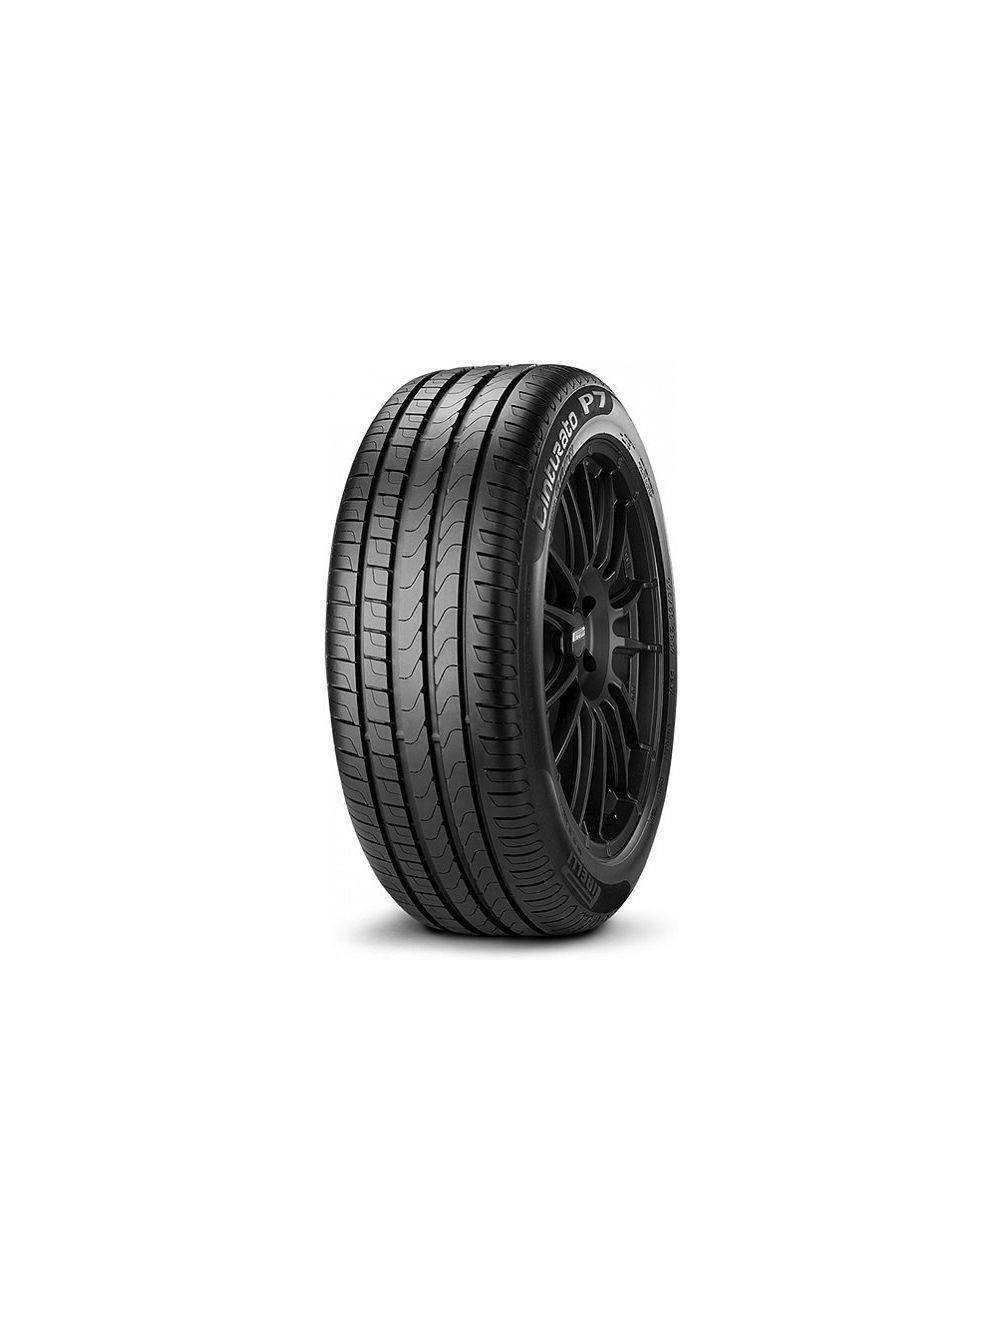 Pirelli 225/45R18 Y P7 Cinturato XL RunFlat MOE Nyári gumi